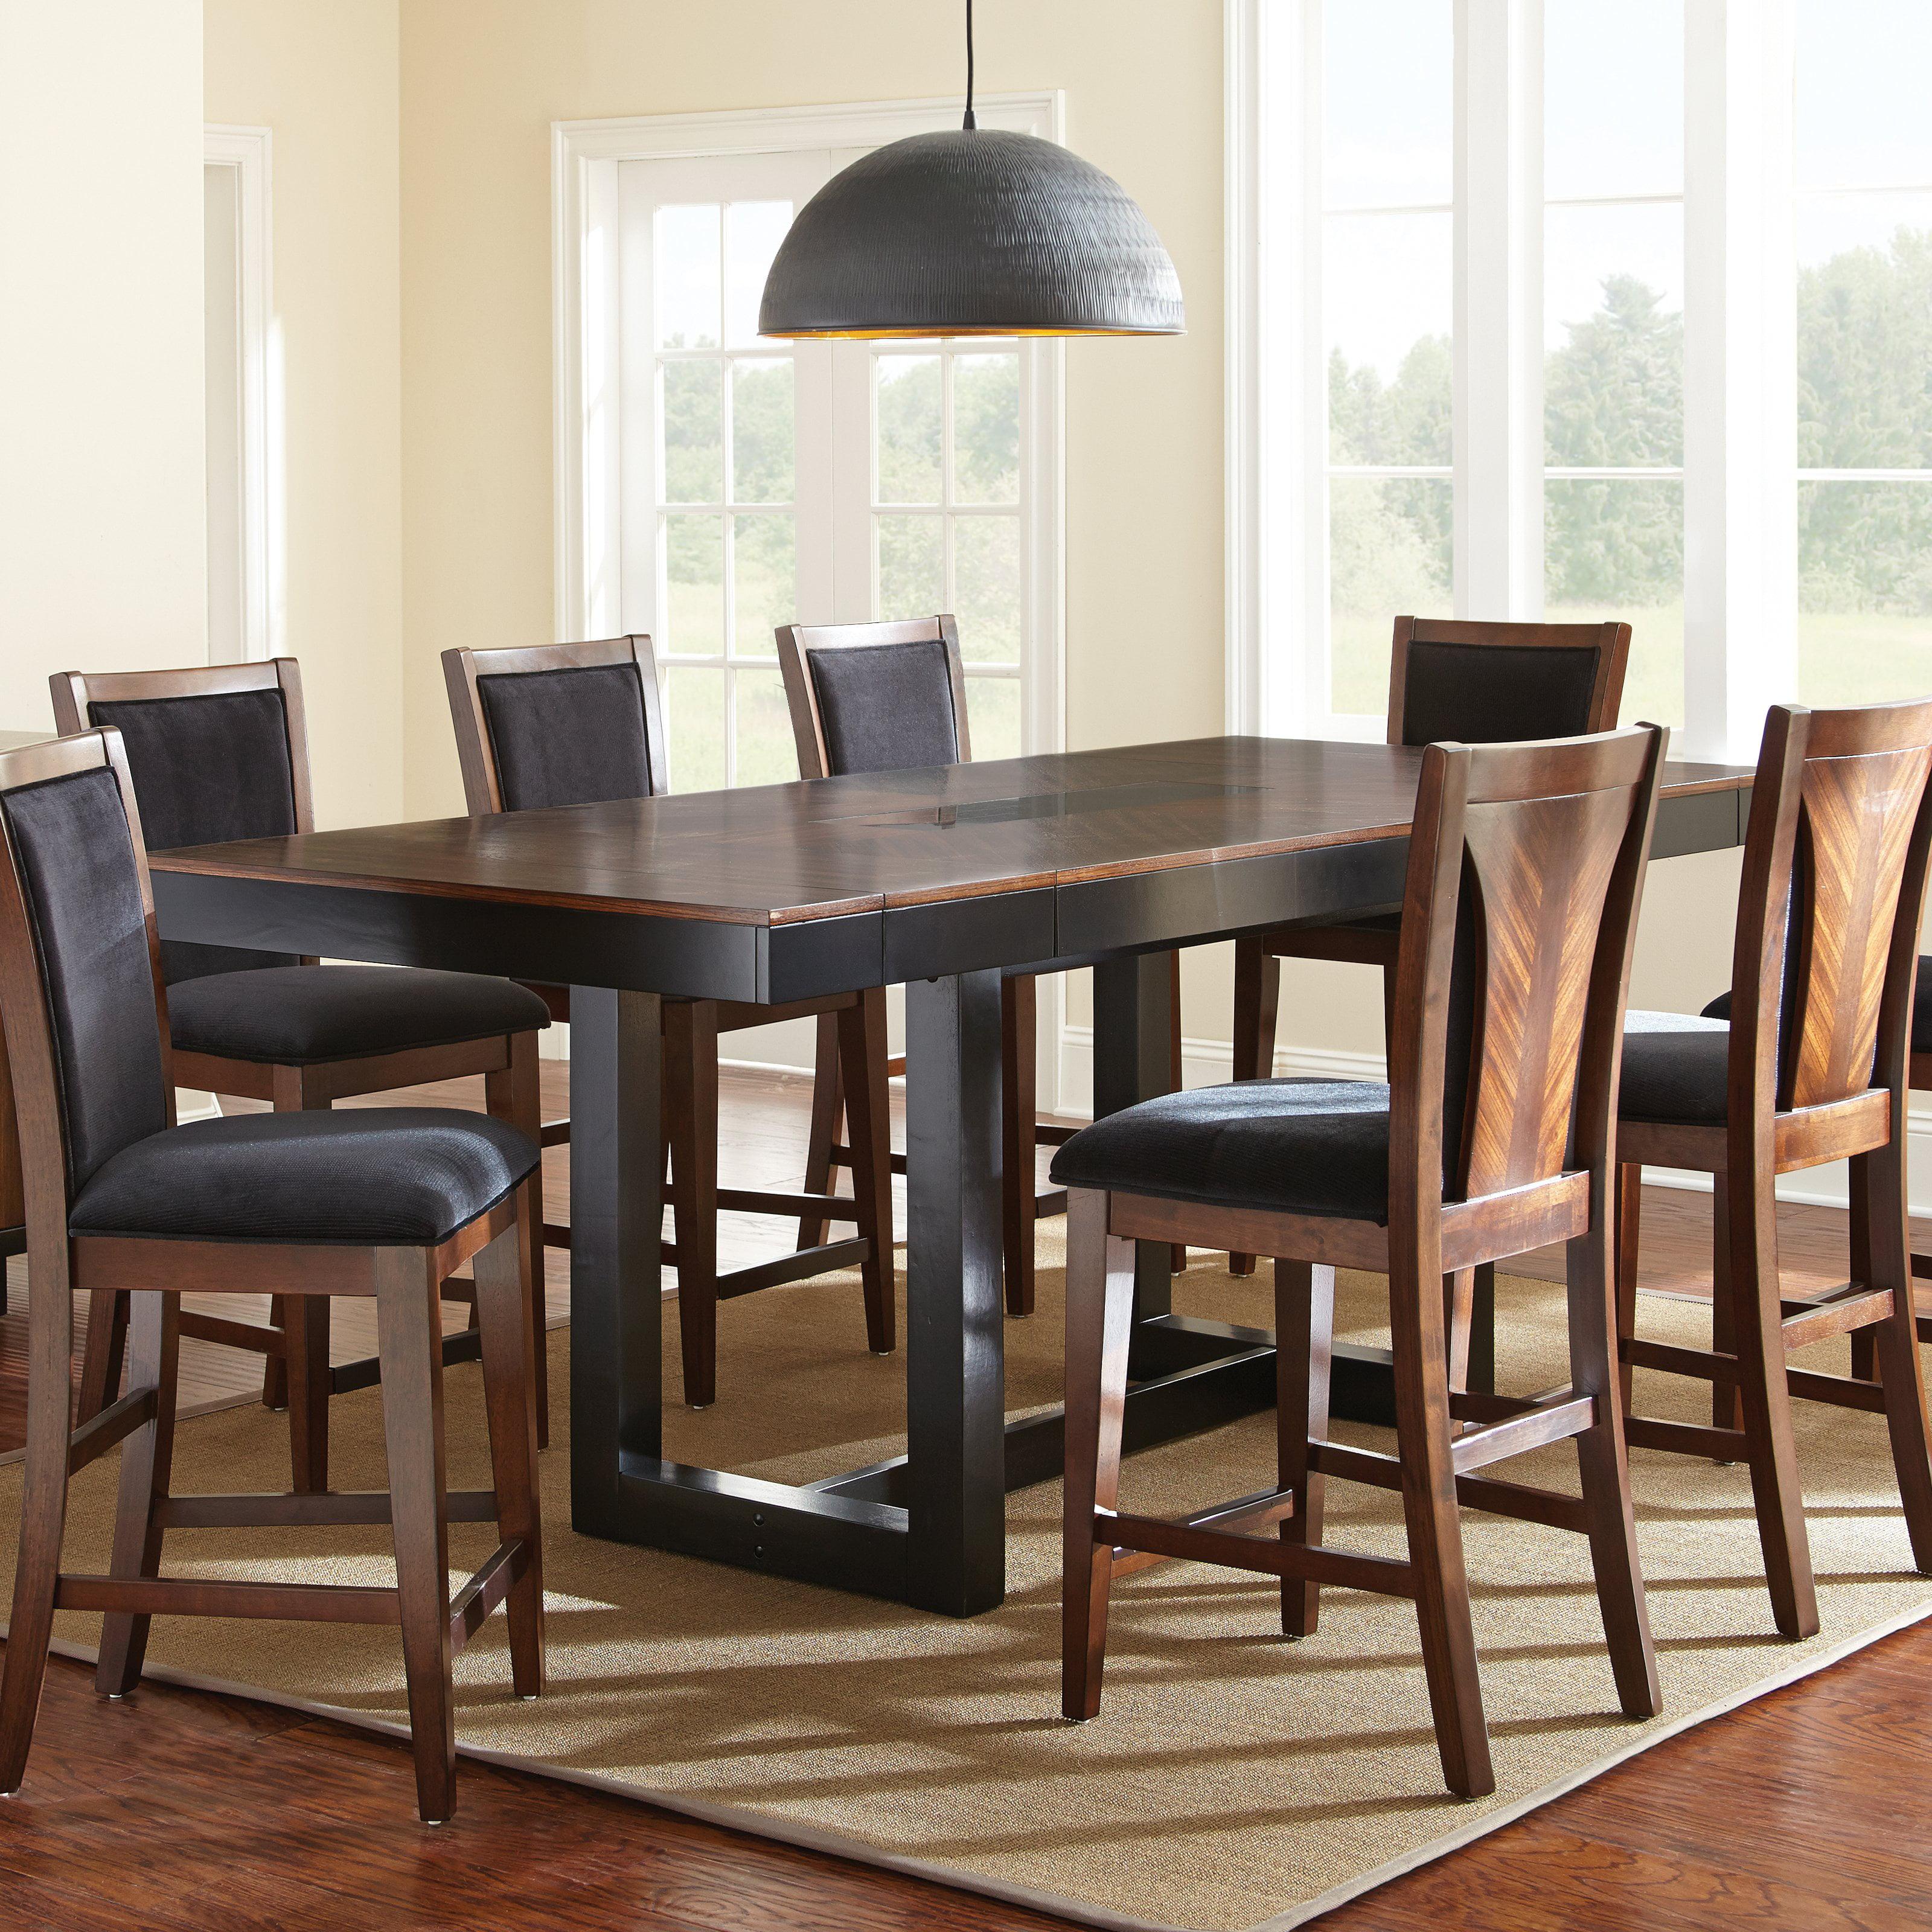 Steve Silver Julian Counter Height Dining Table Black Walnut